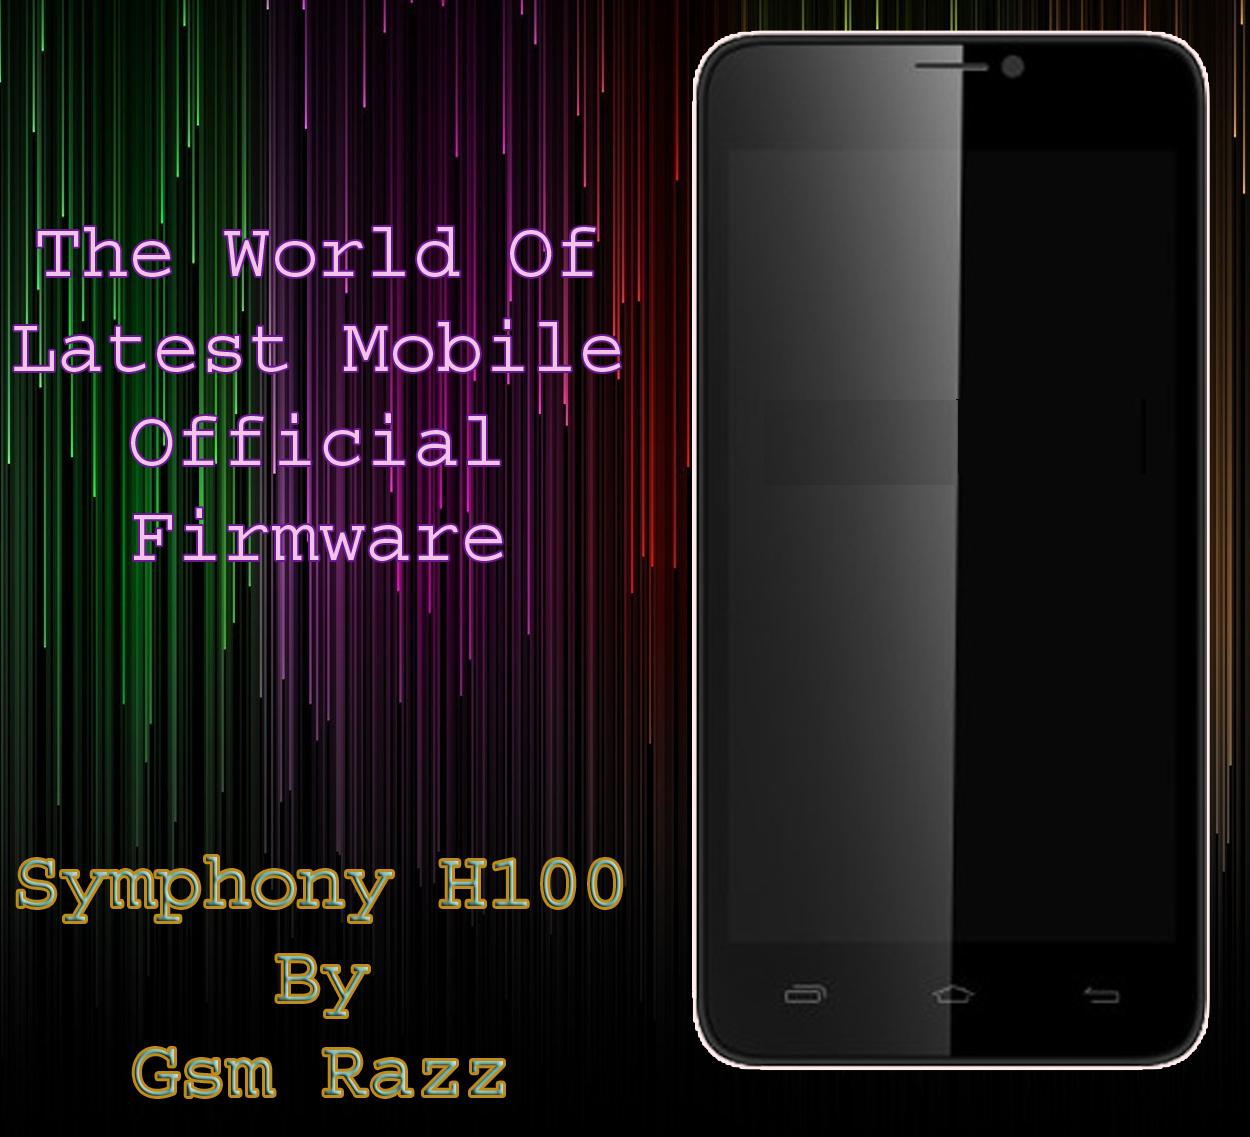 Symphony H100_1_XXX_V02 1_V1 0 Official Firmware Flash File